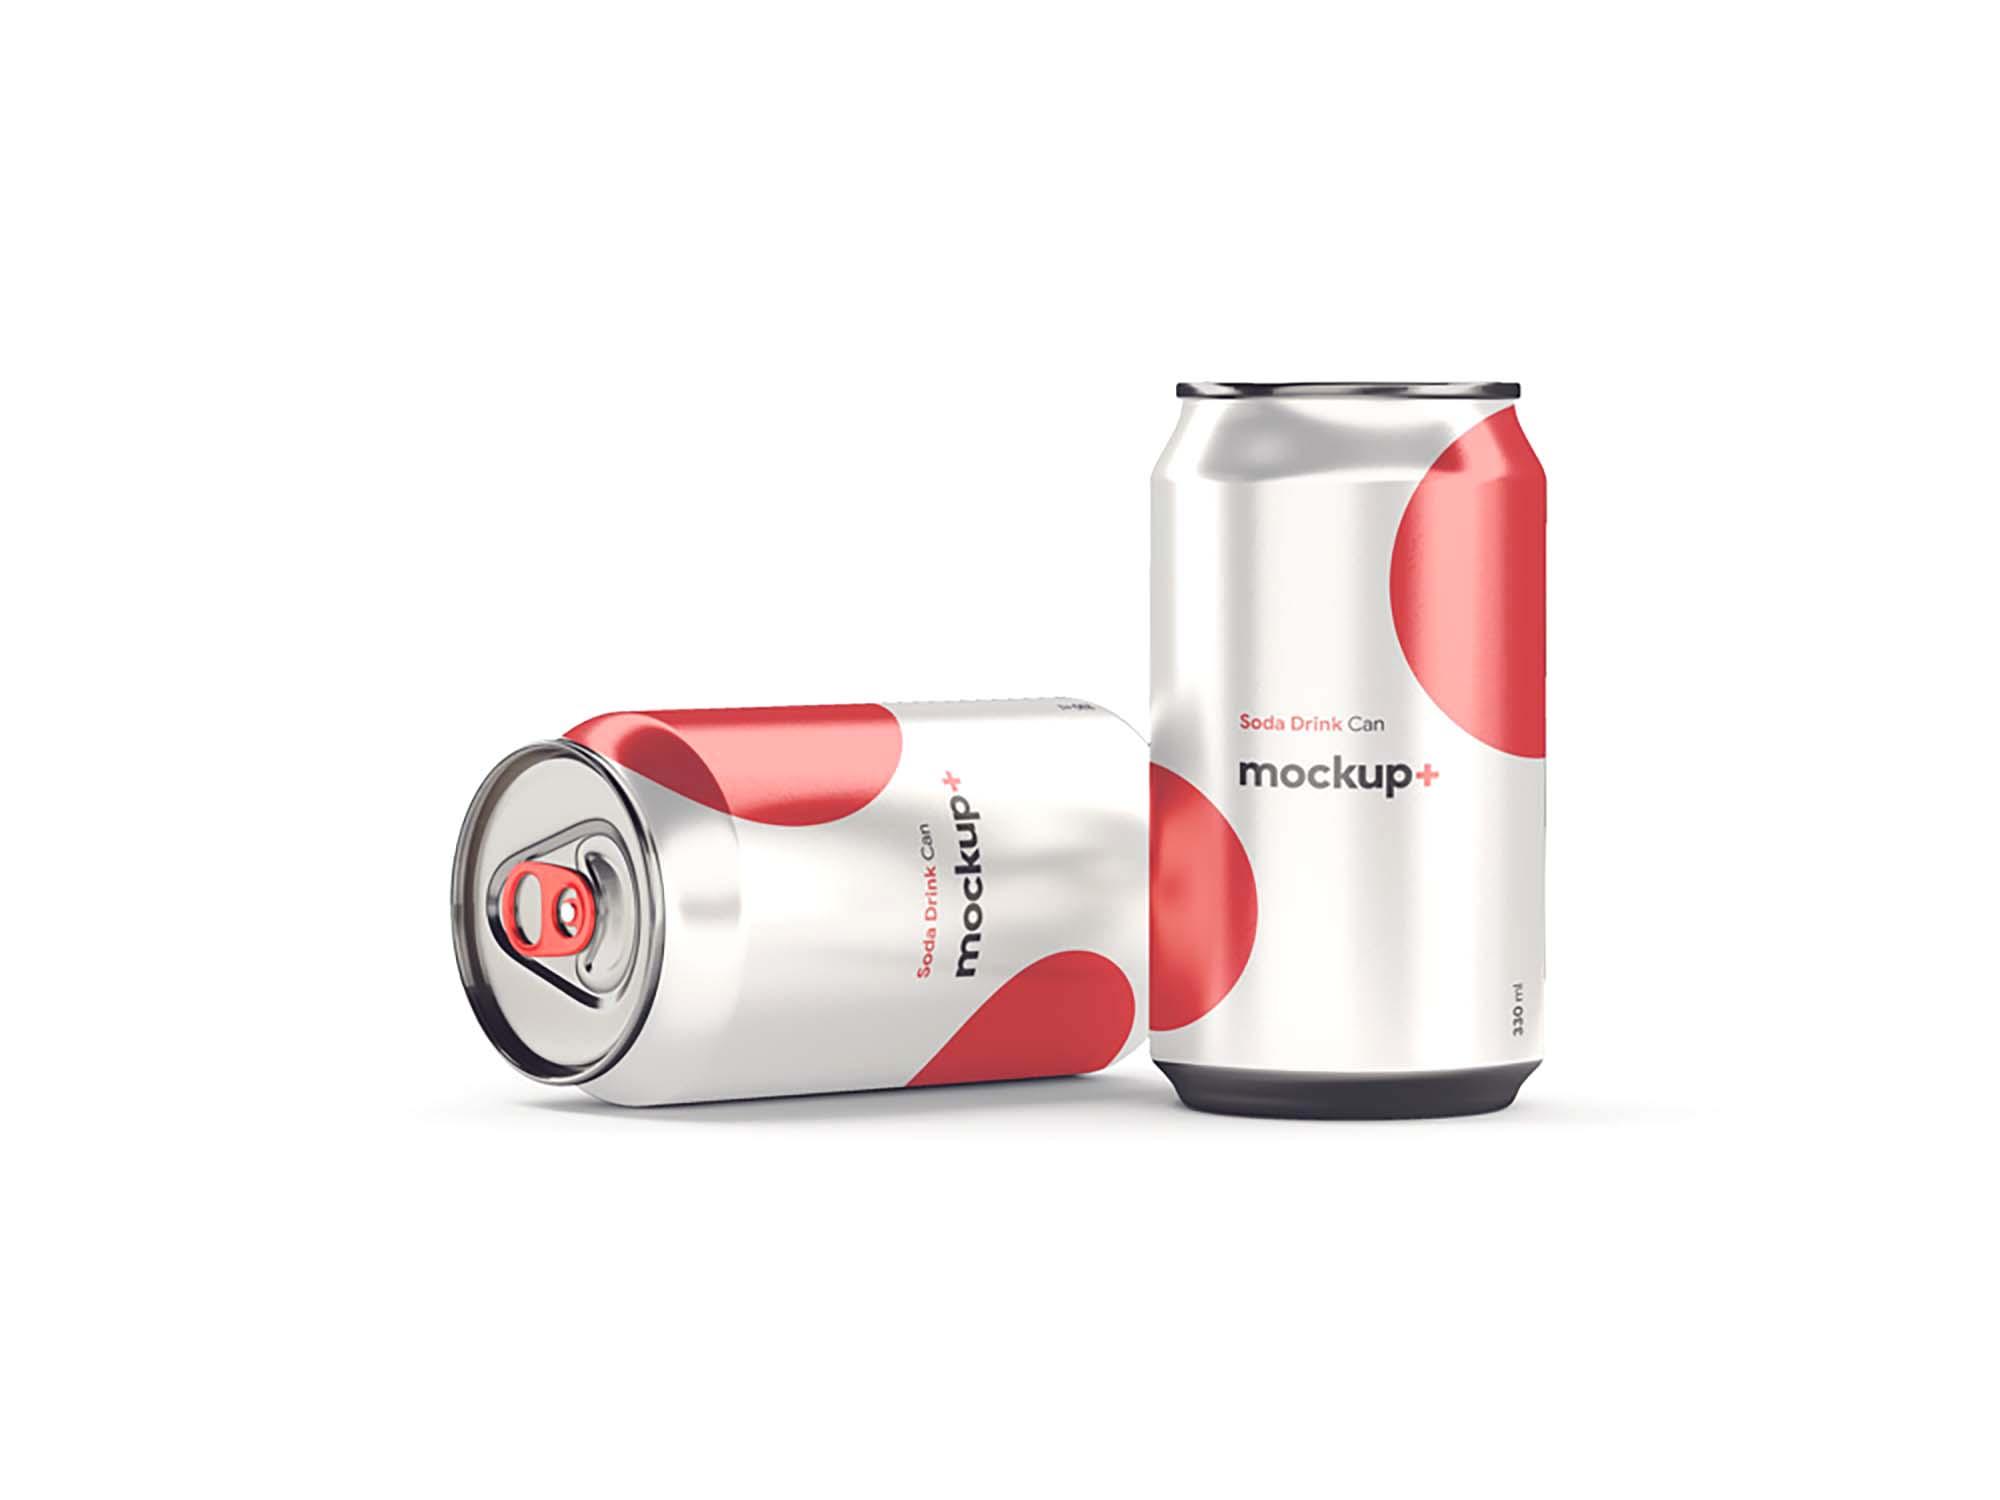 Soda Drink Can Mockup 2